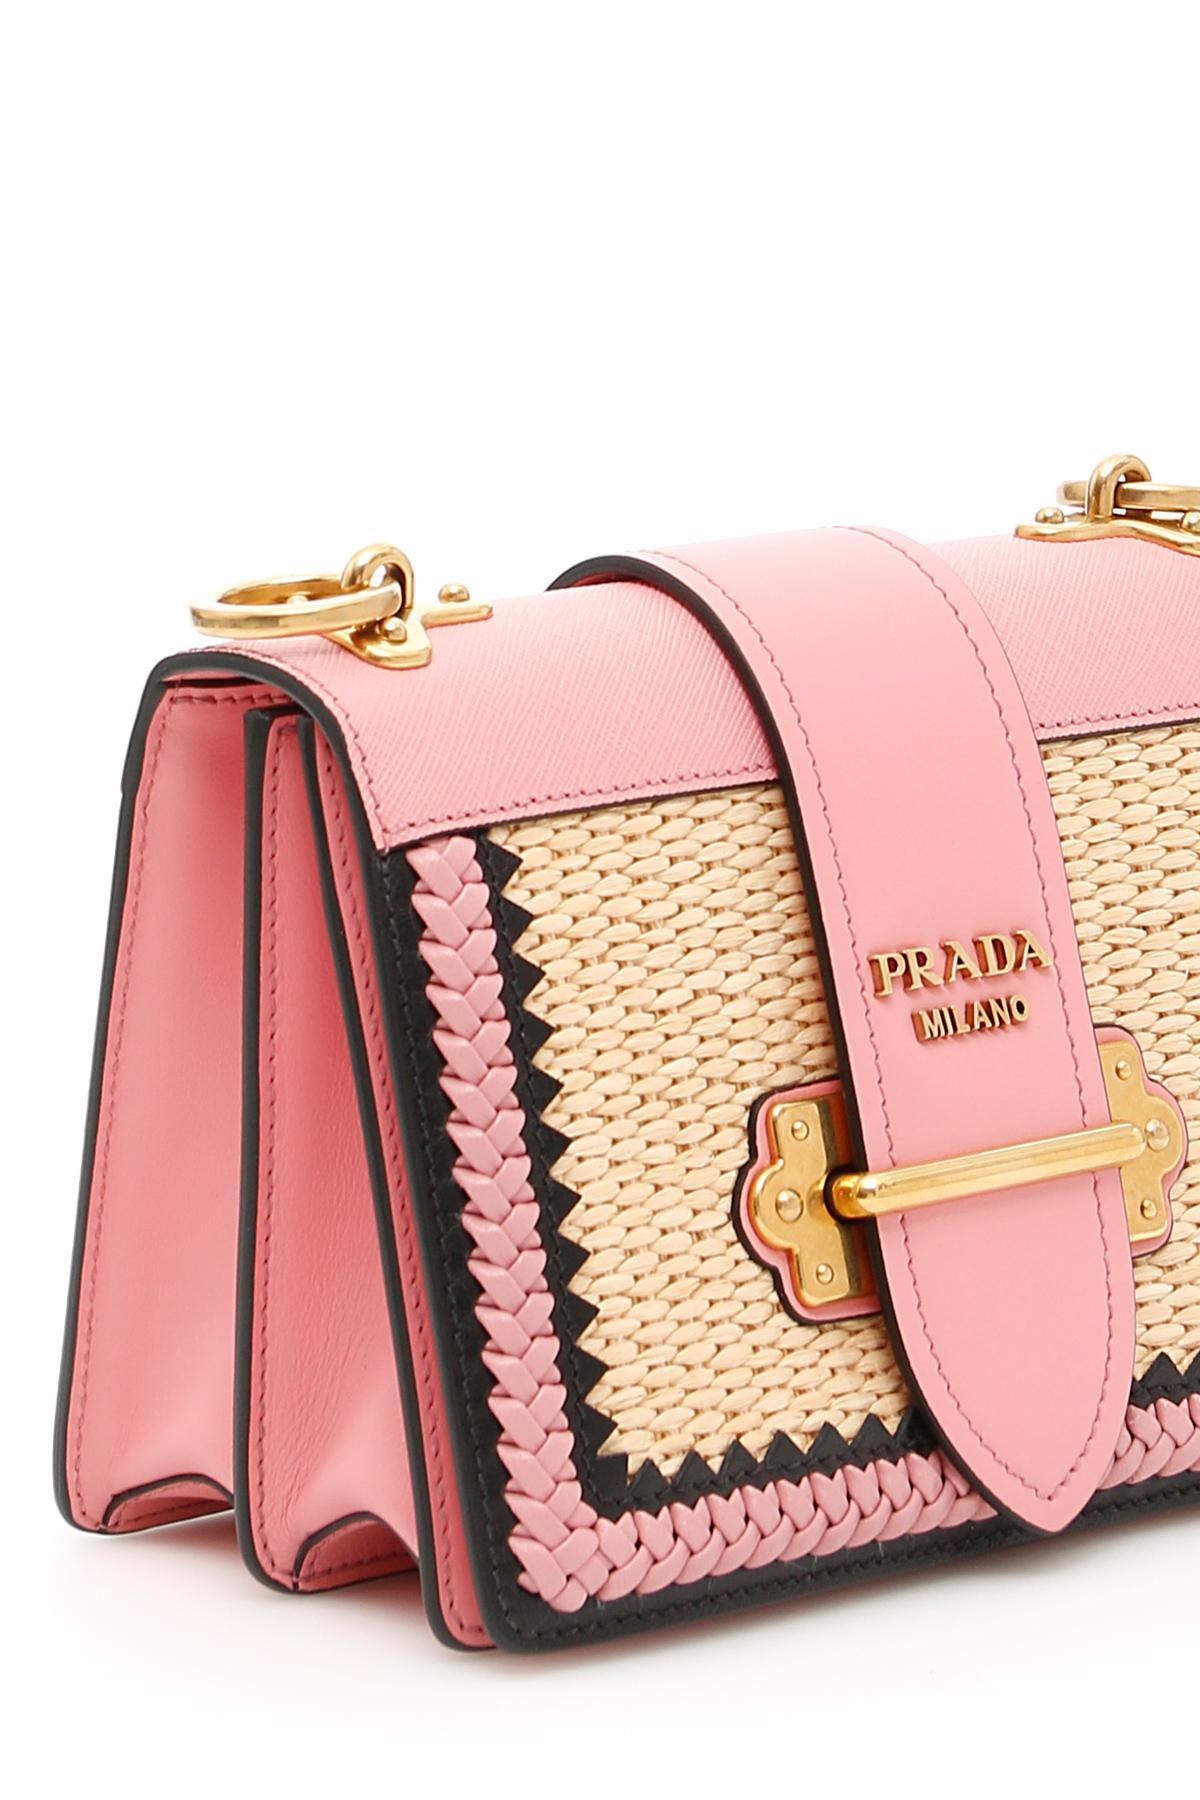 99de040d70e4 ... wholesale prada pink calfskin and straw cahier bag lyst. view  fullscreen 9e034 1230d